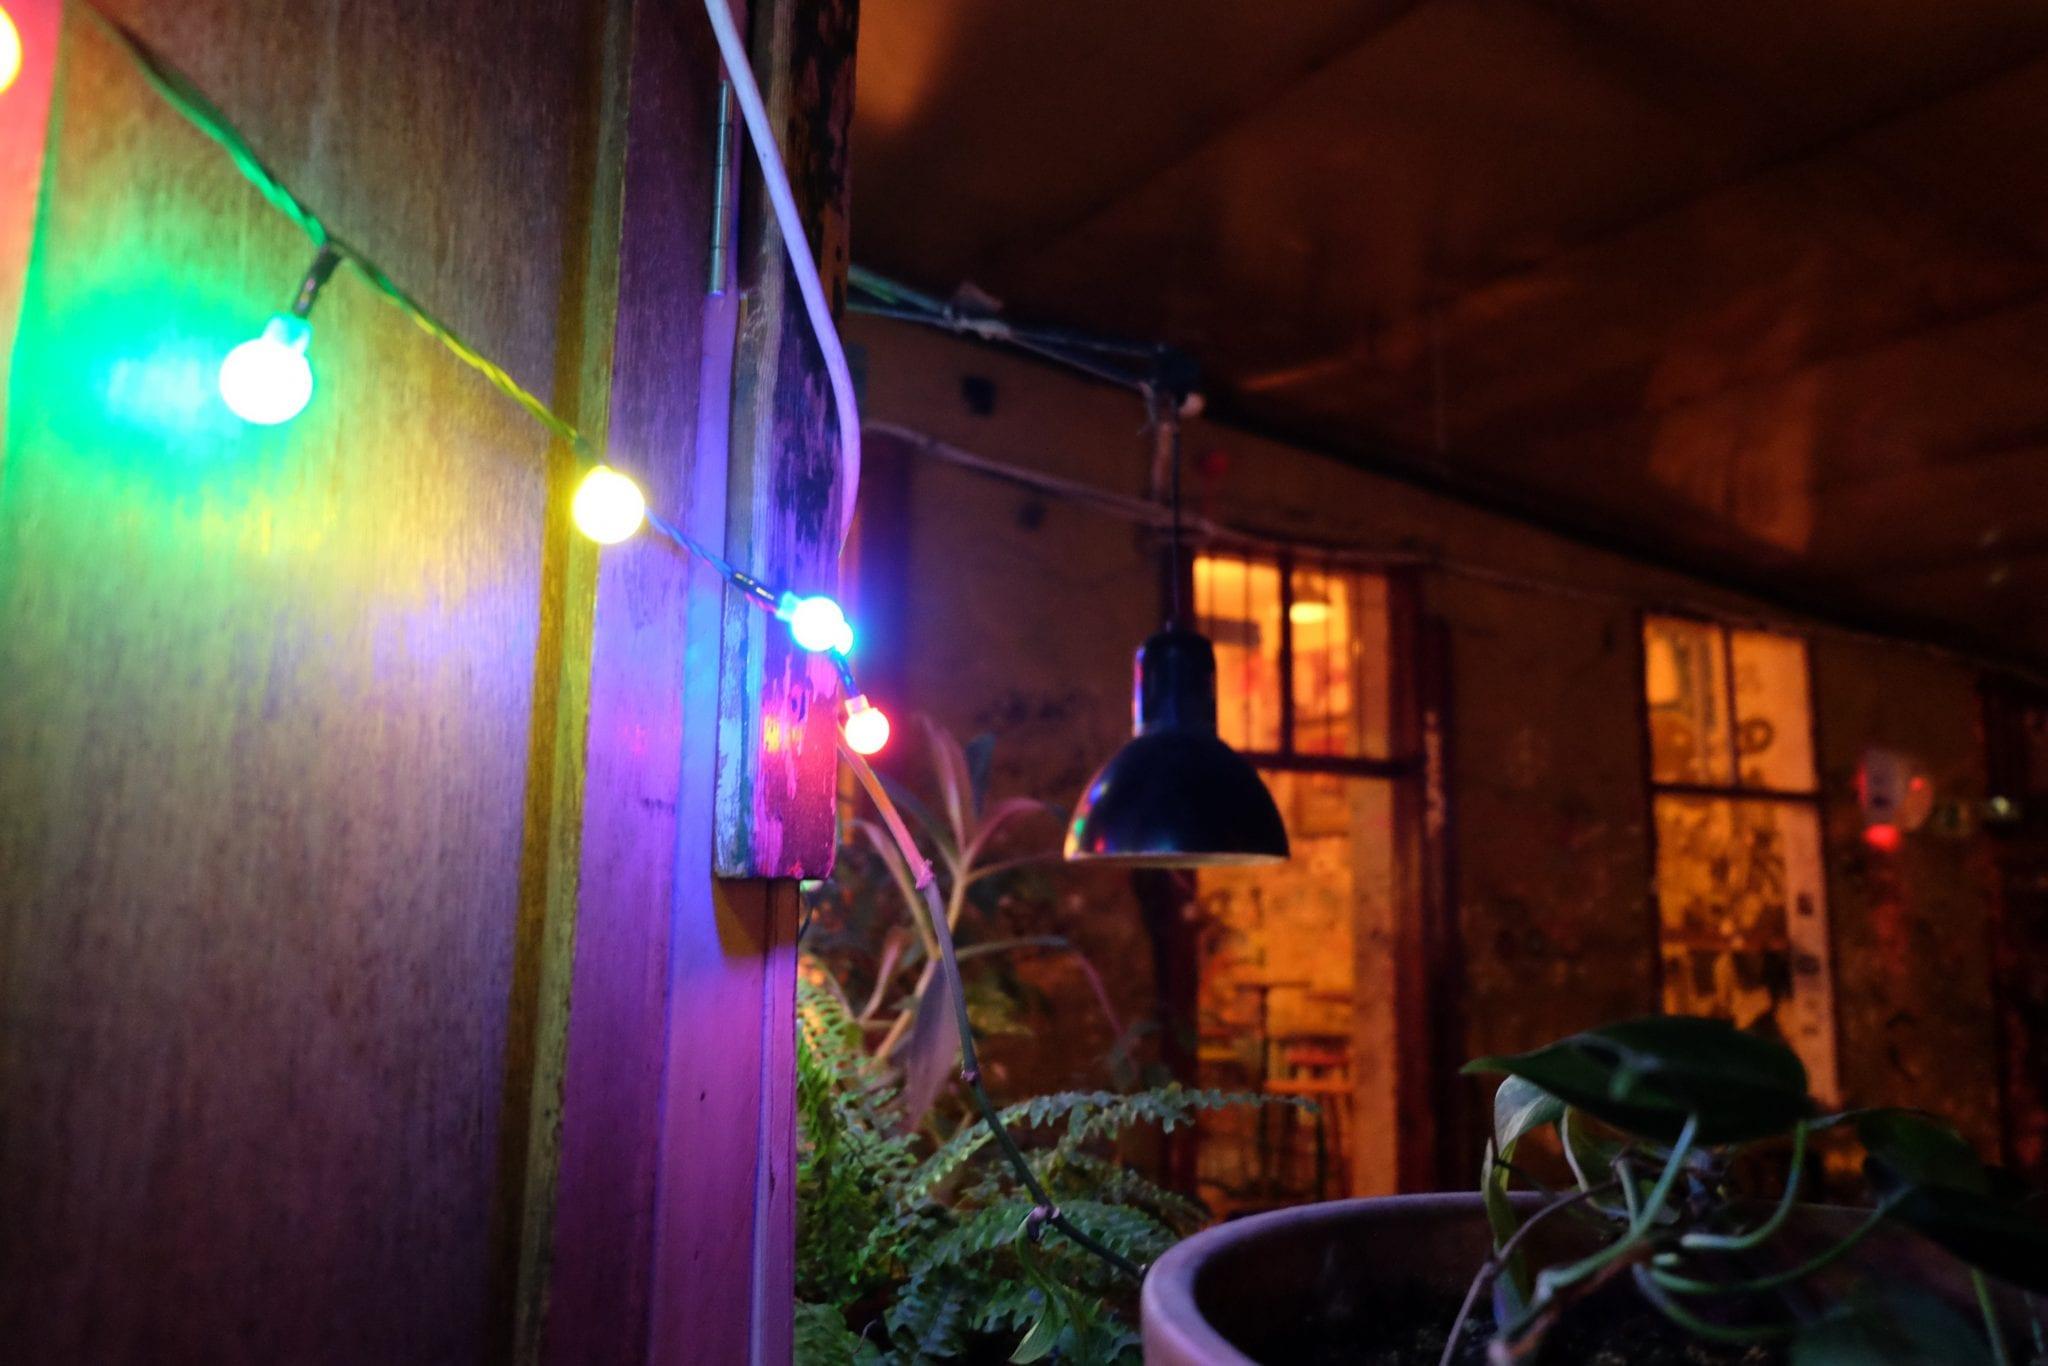 Simpla Kert interior lights